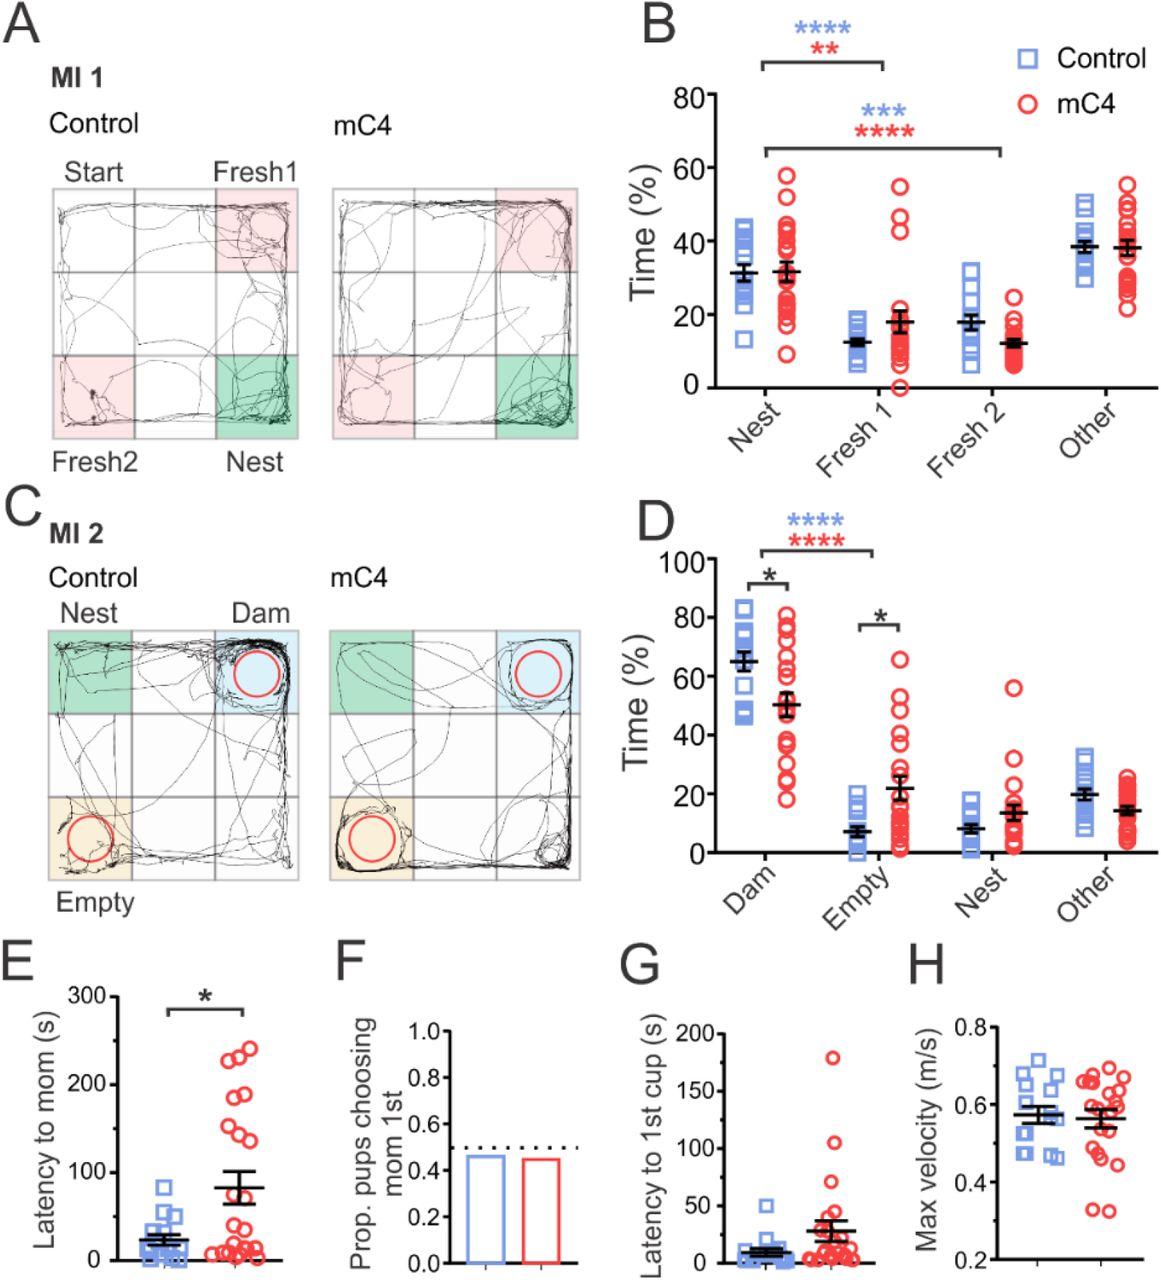 Increased expression of schizophrenia-associated gene C4